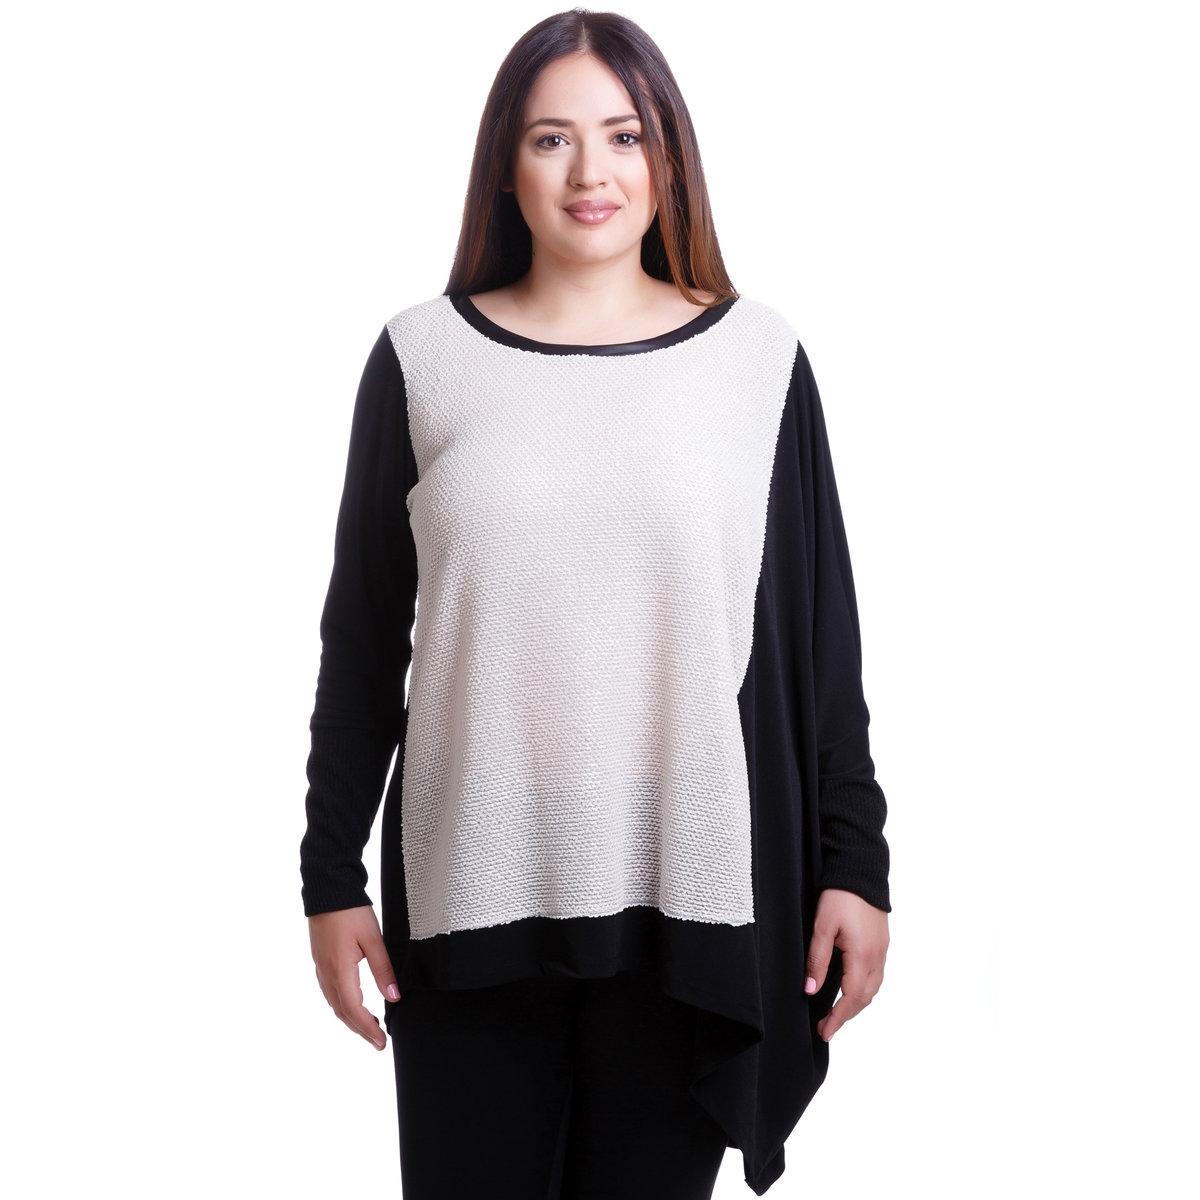 Блузка асимметричного покроя с длинными рукавами от MAT FASHION